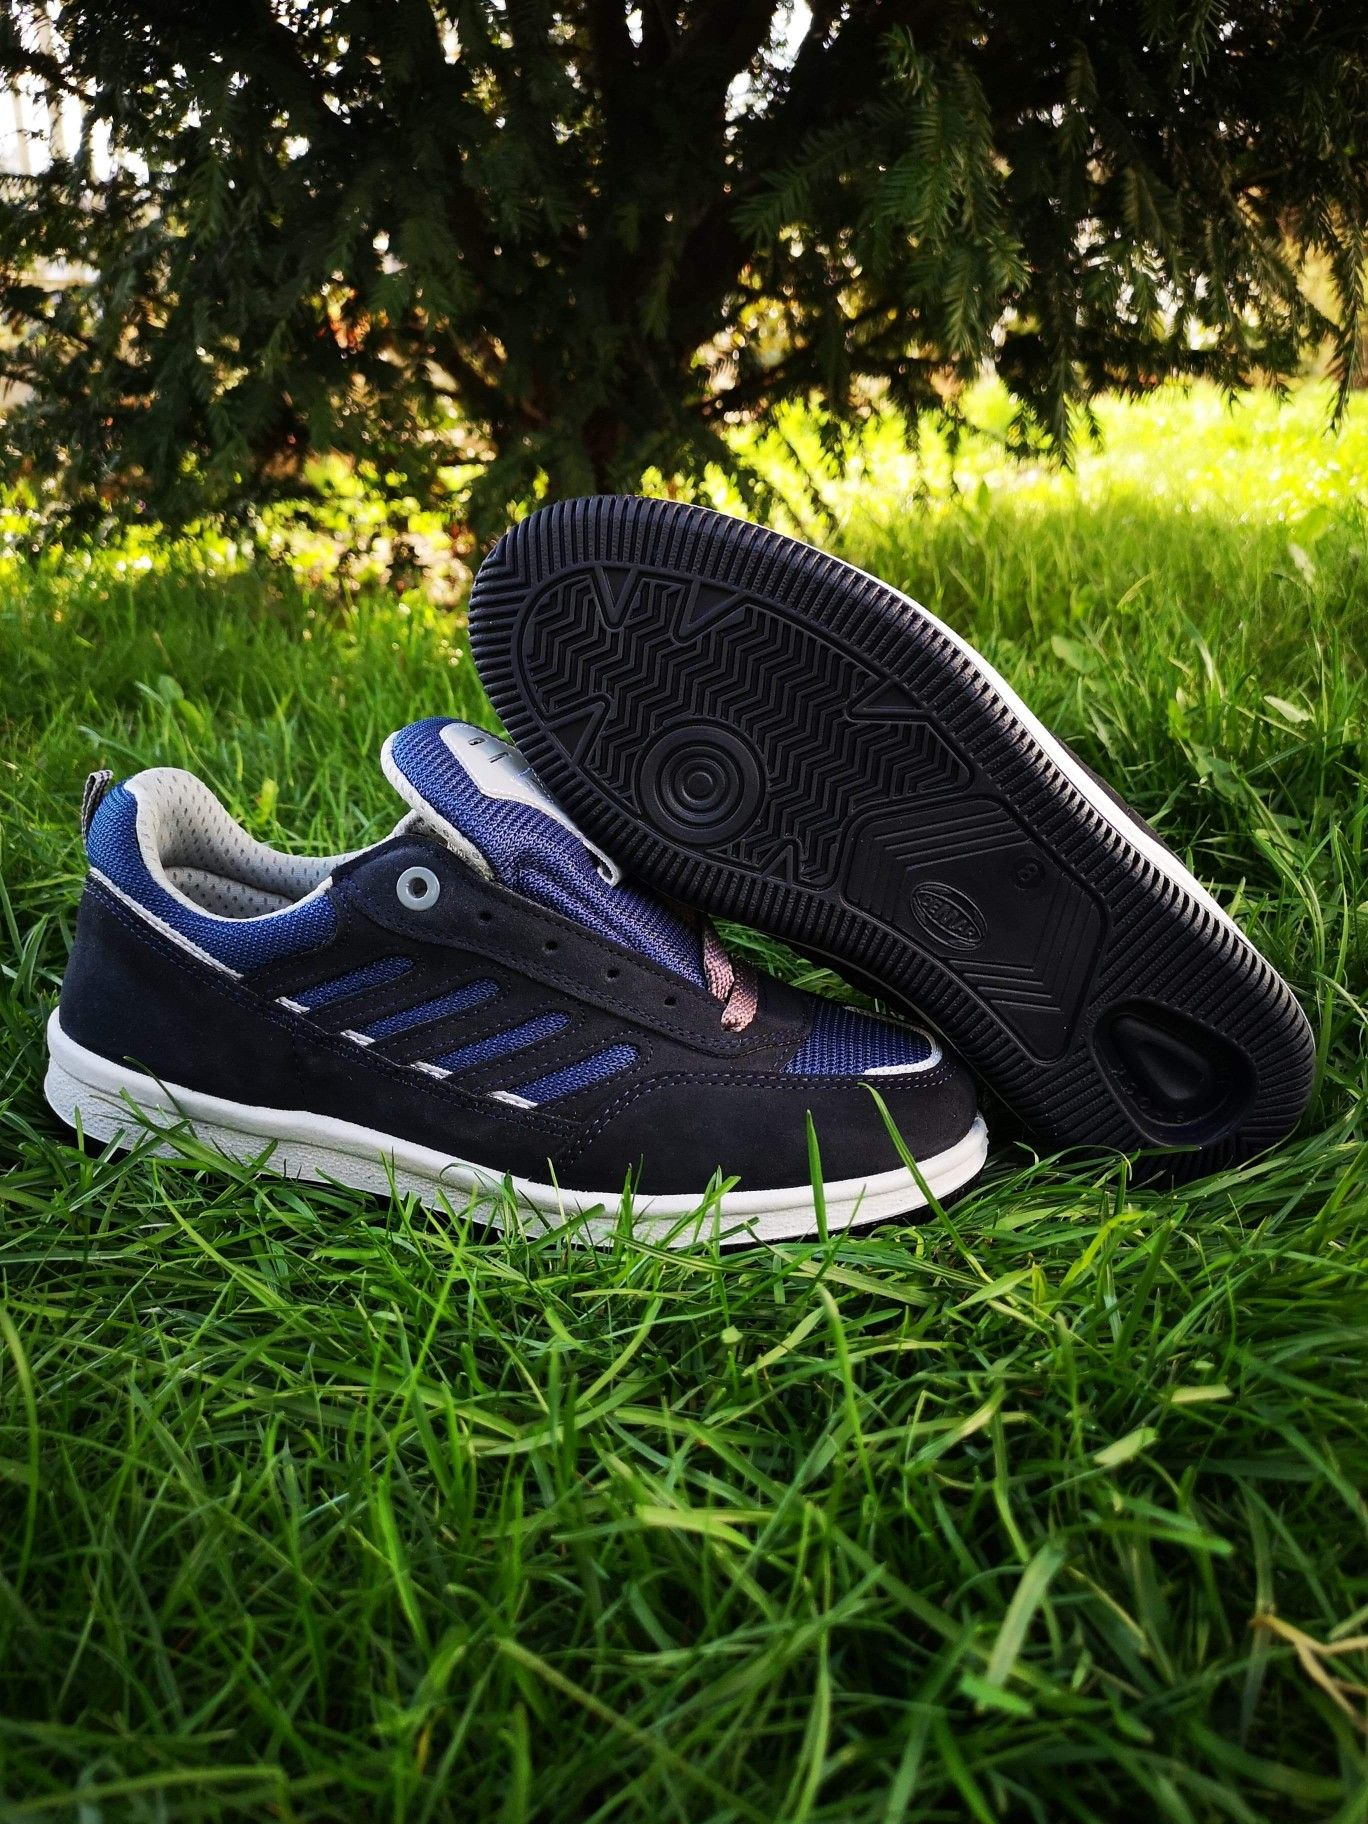 Adidasy Wojskowe 904 Mon Demar Platform Sneakers Puma Platform Shoes